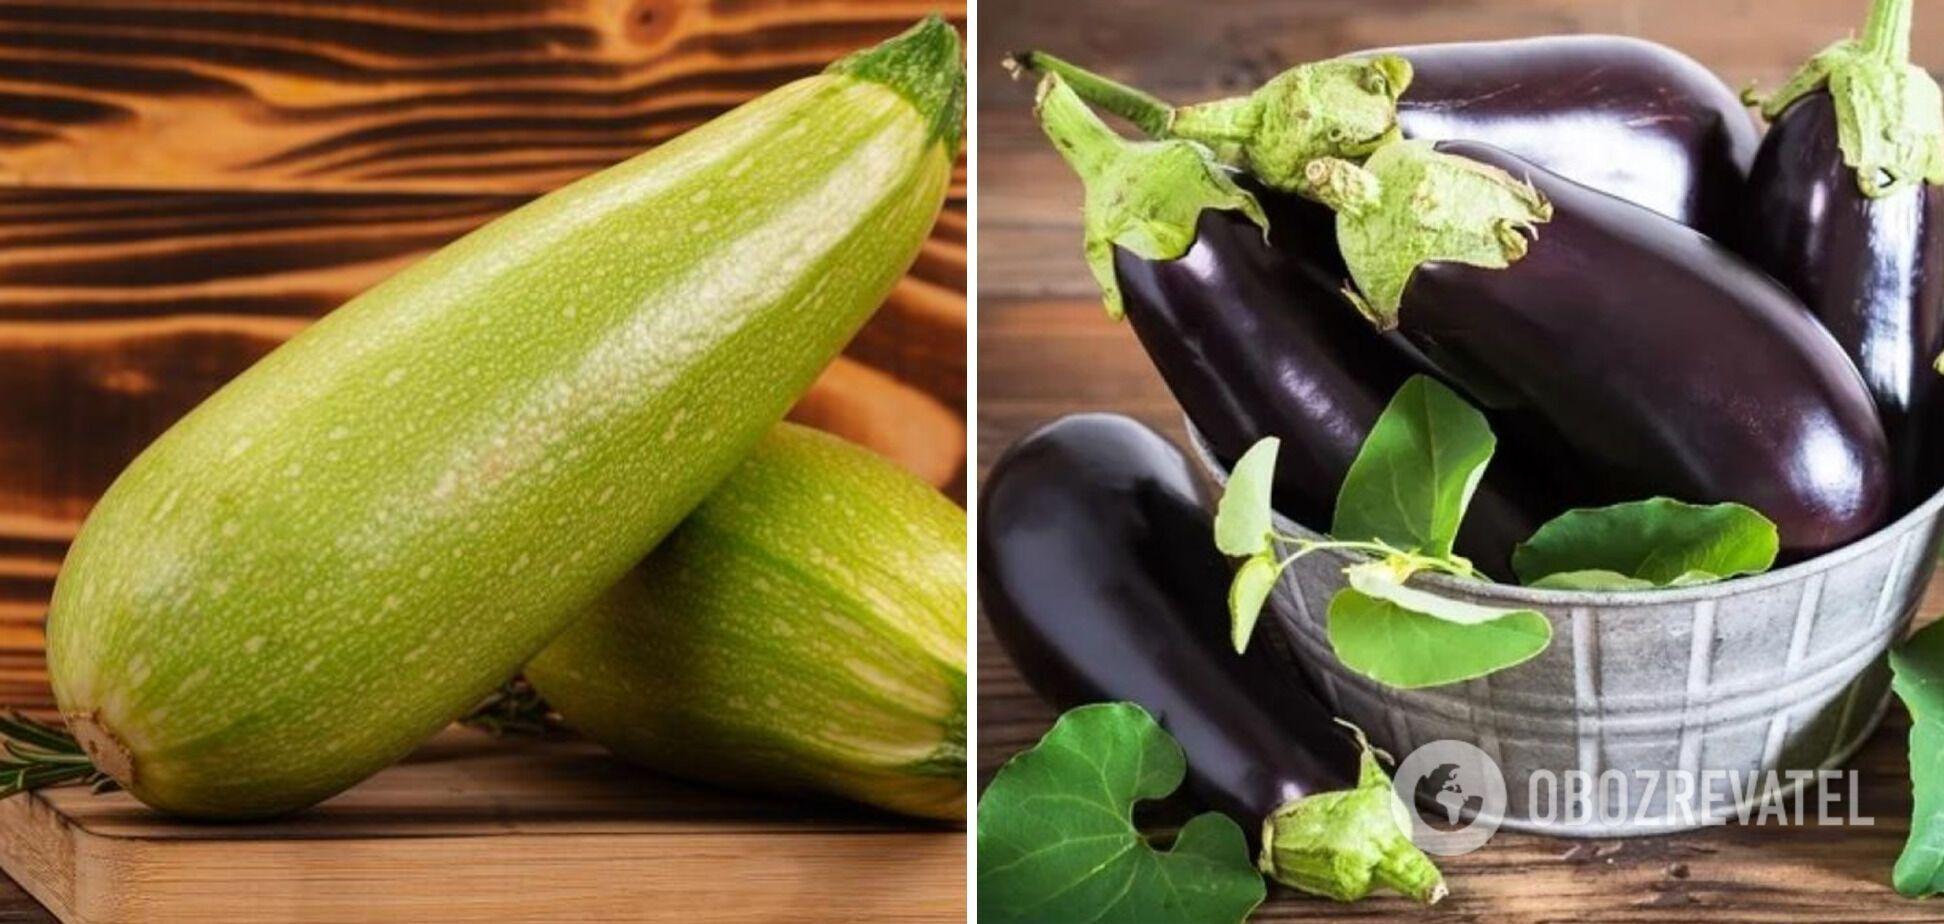 Як смачно приготувати кабачки та баклажани: поради від Євгена Поливоди